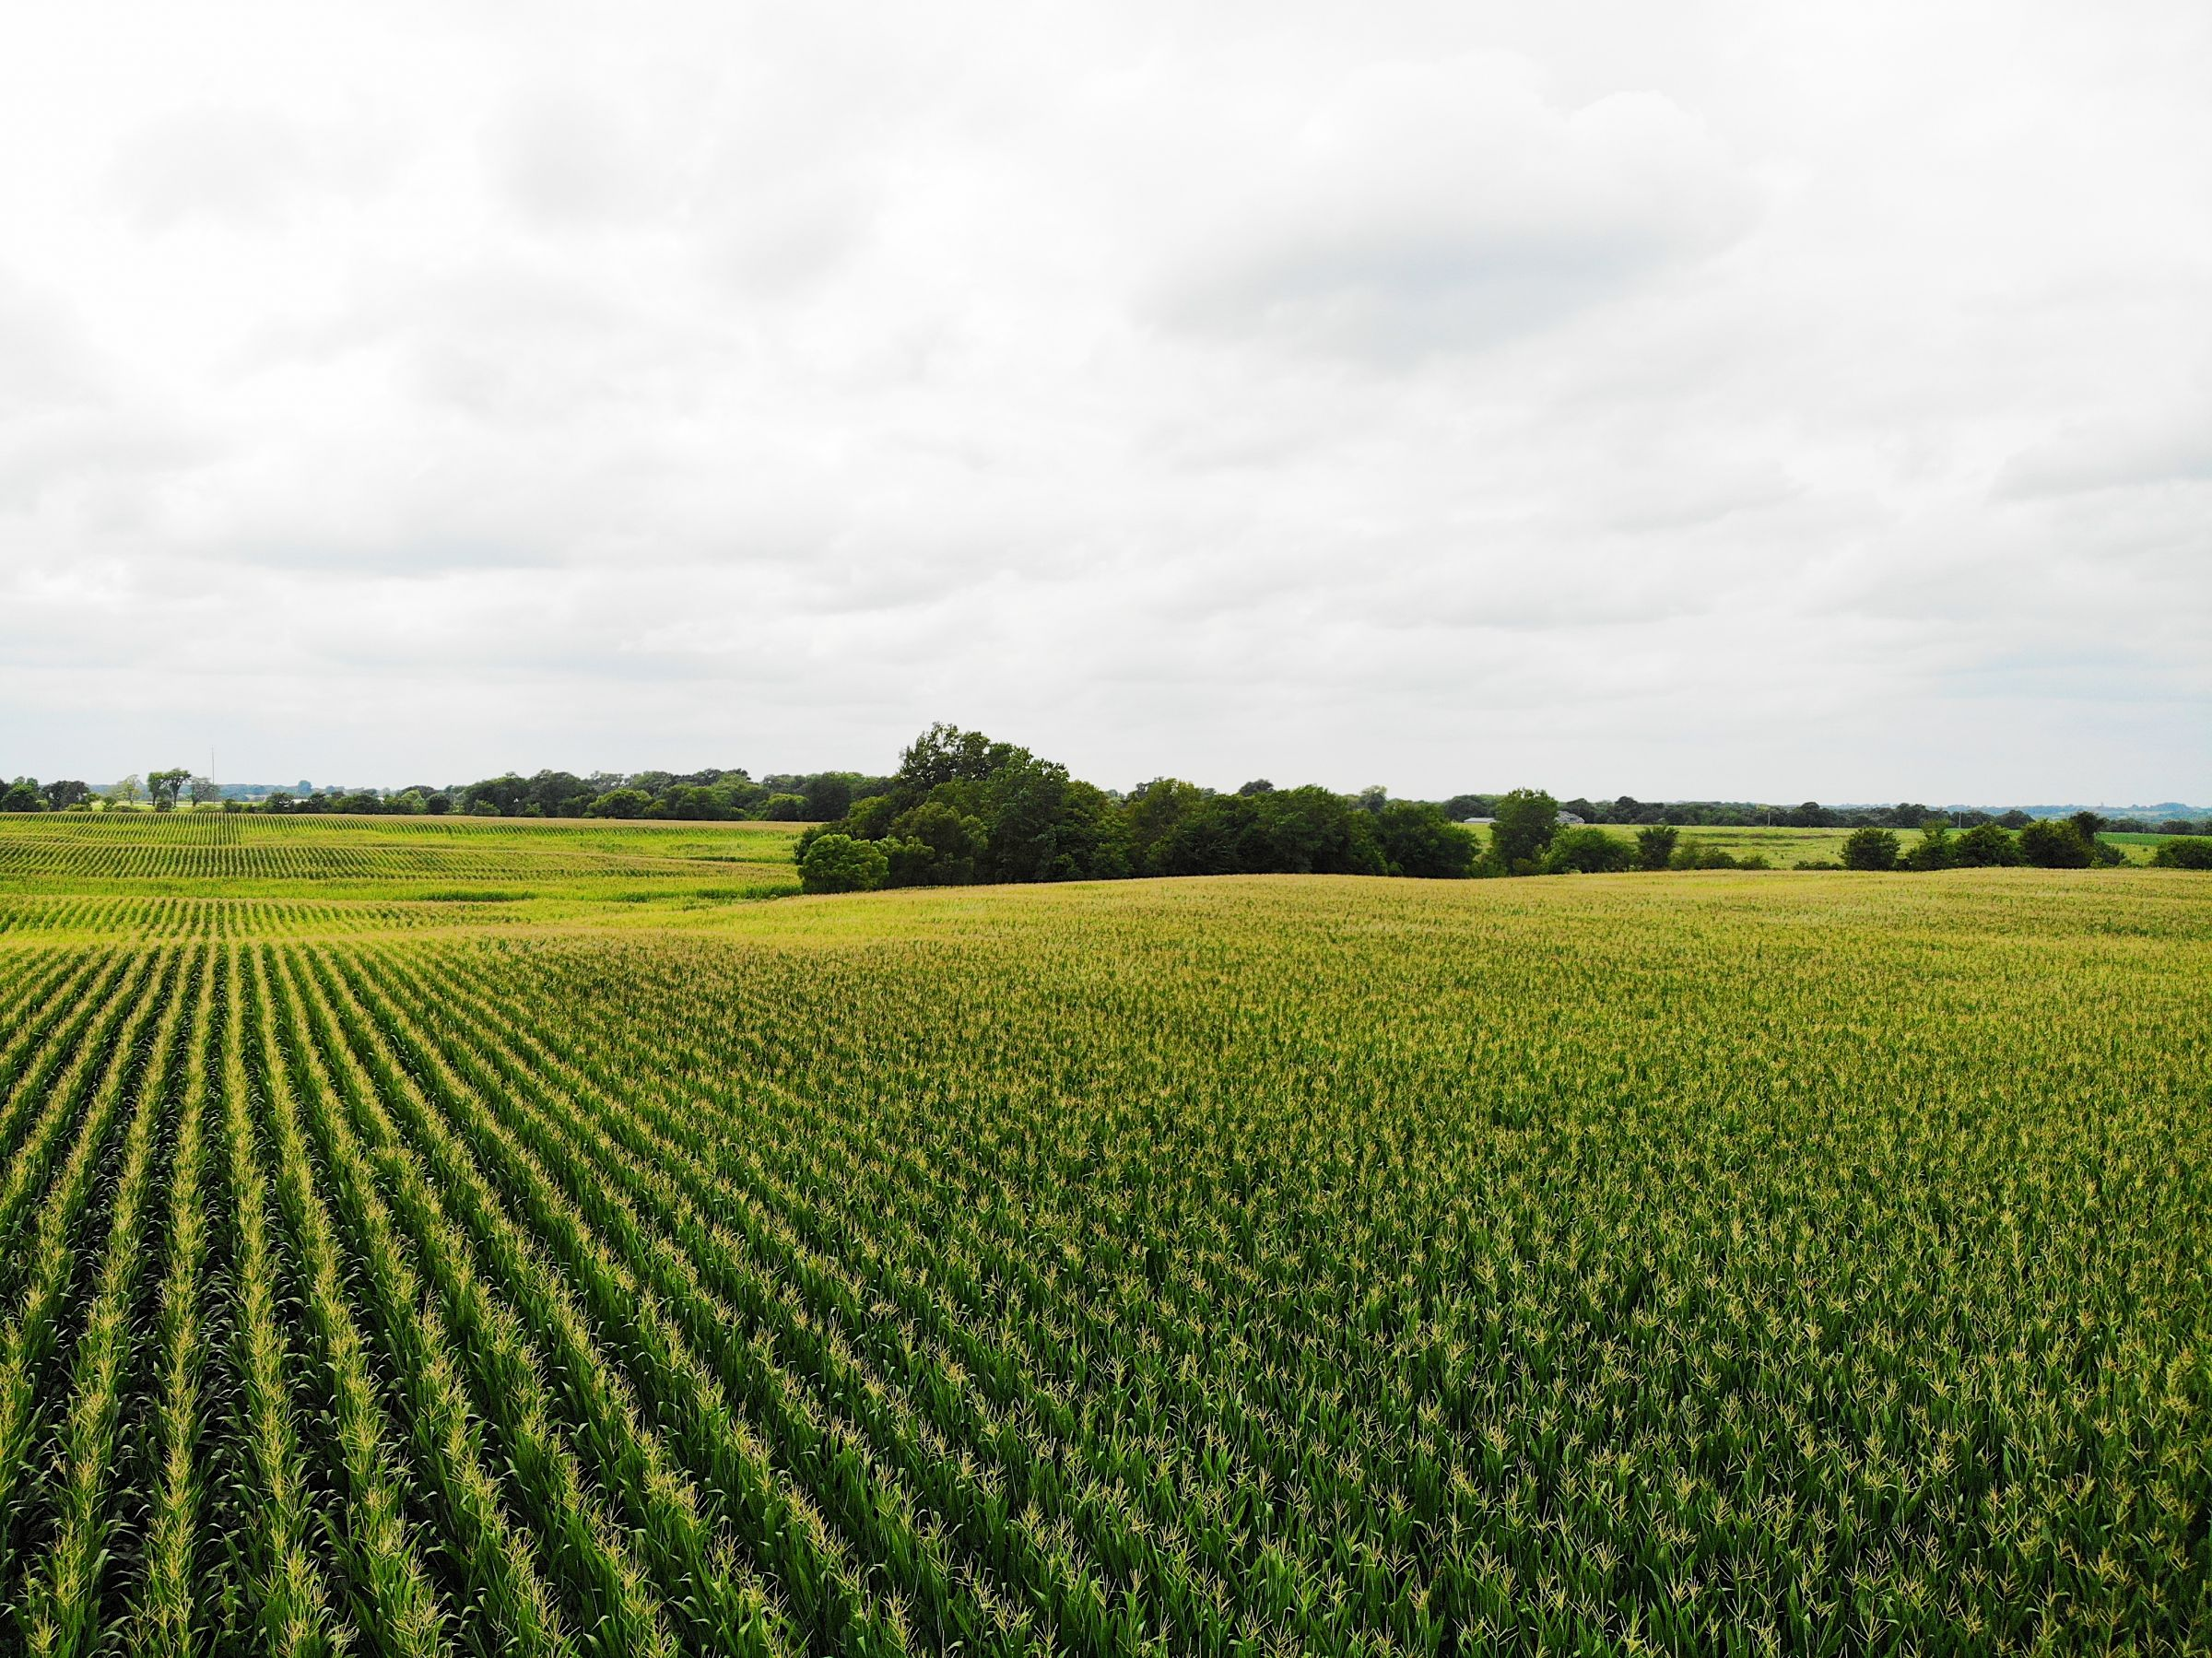 land-clarke-county-iowa-72-acres-listing-number-15106-2-2020-08-09-034302.jpg